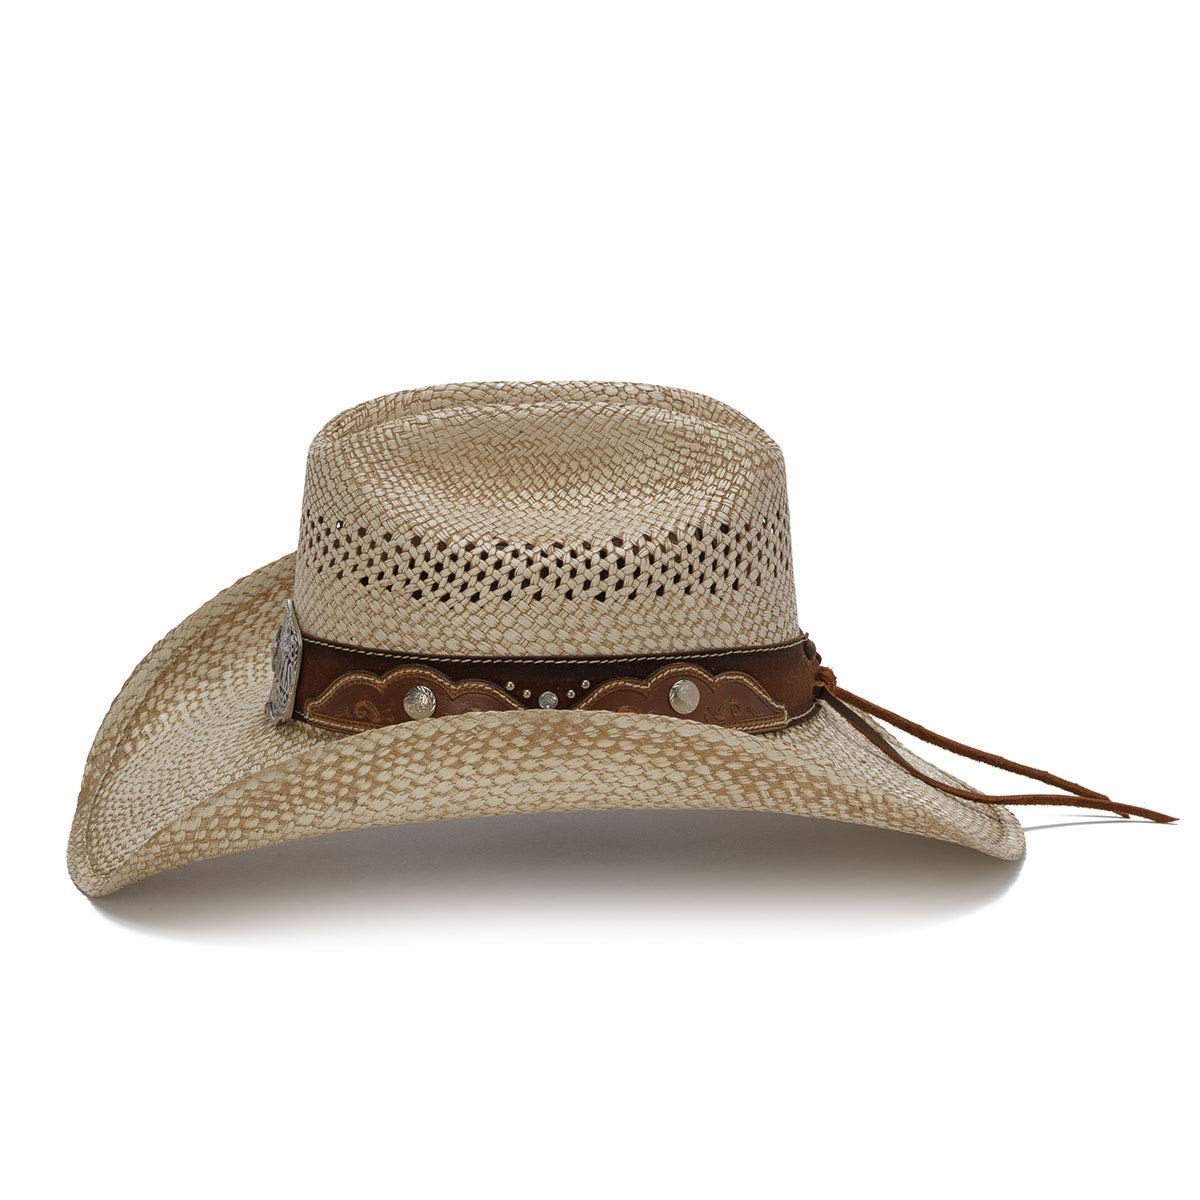 Stampede Hats Mens Gone to Texas Star Rhinestone Western Hat